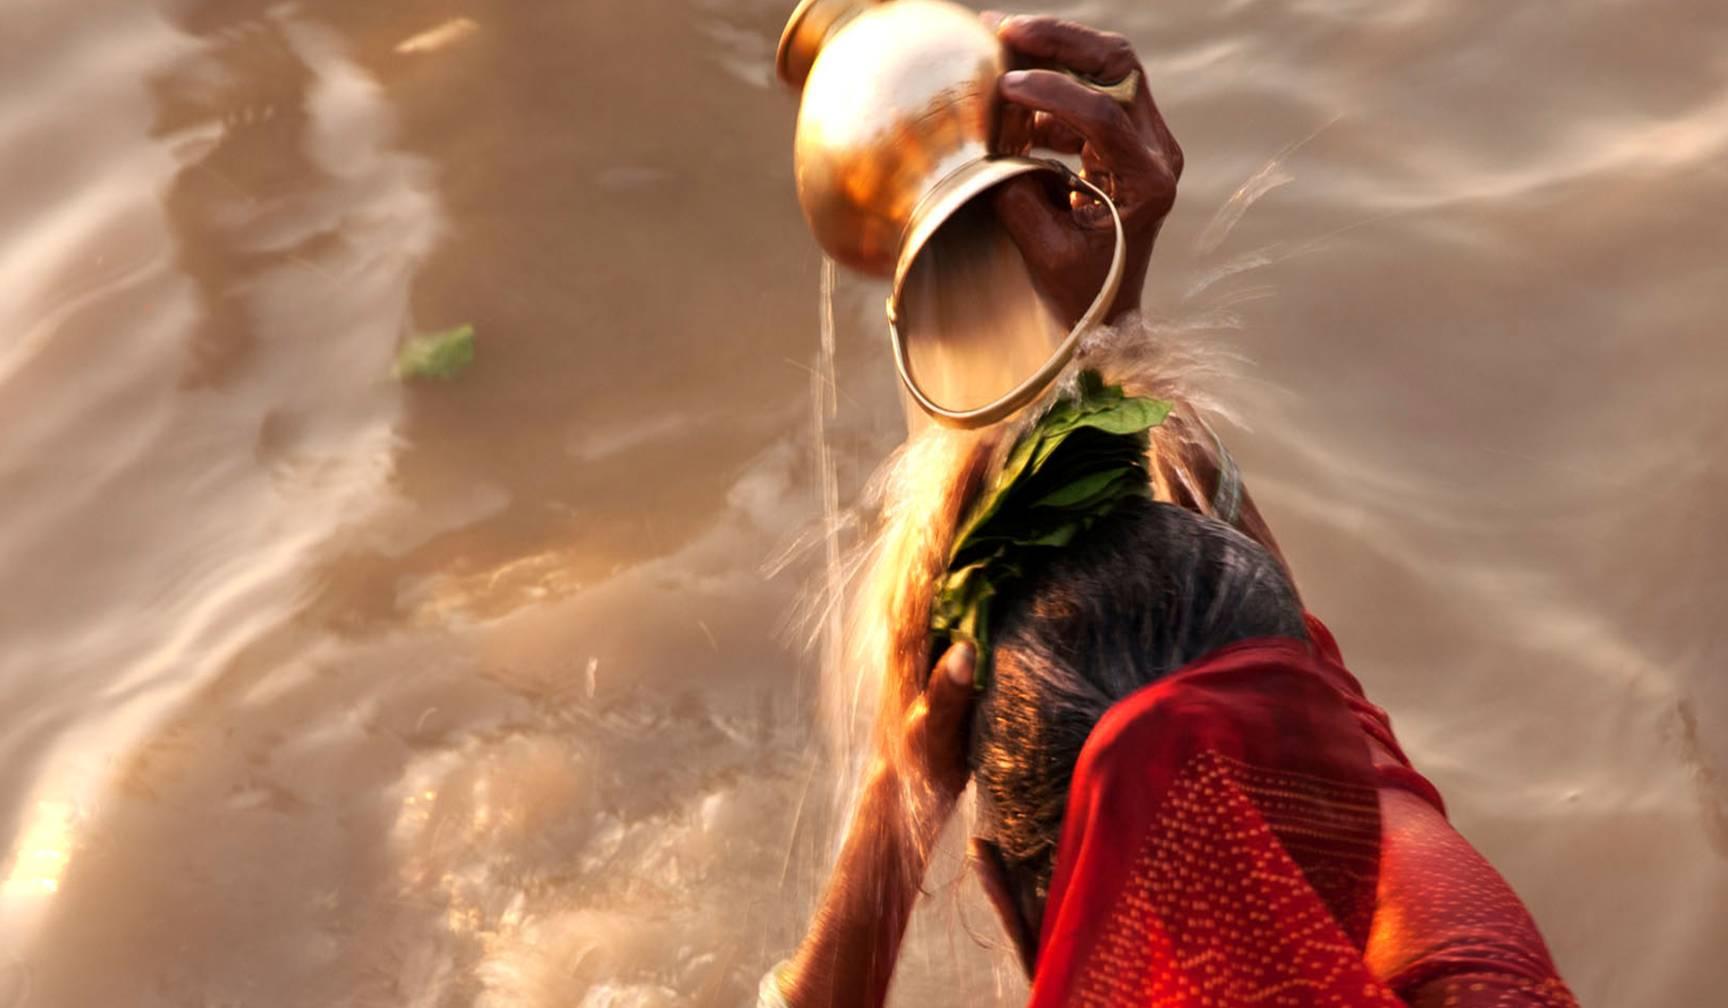 PunjabKesari, bath image